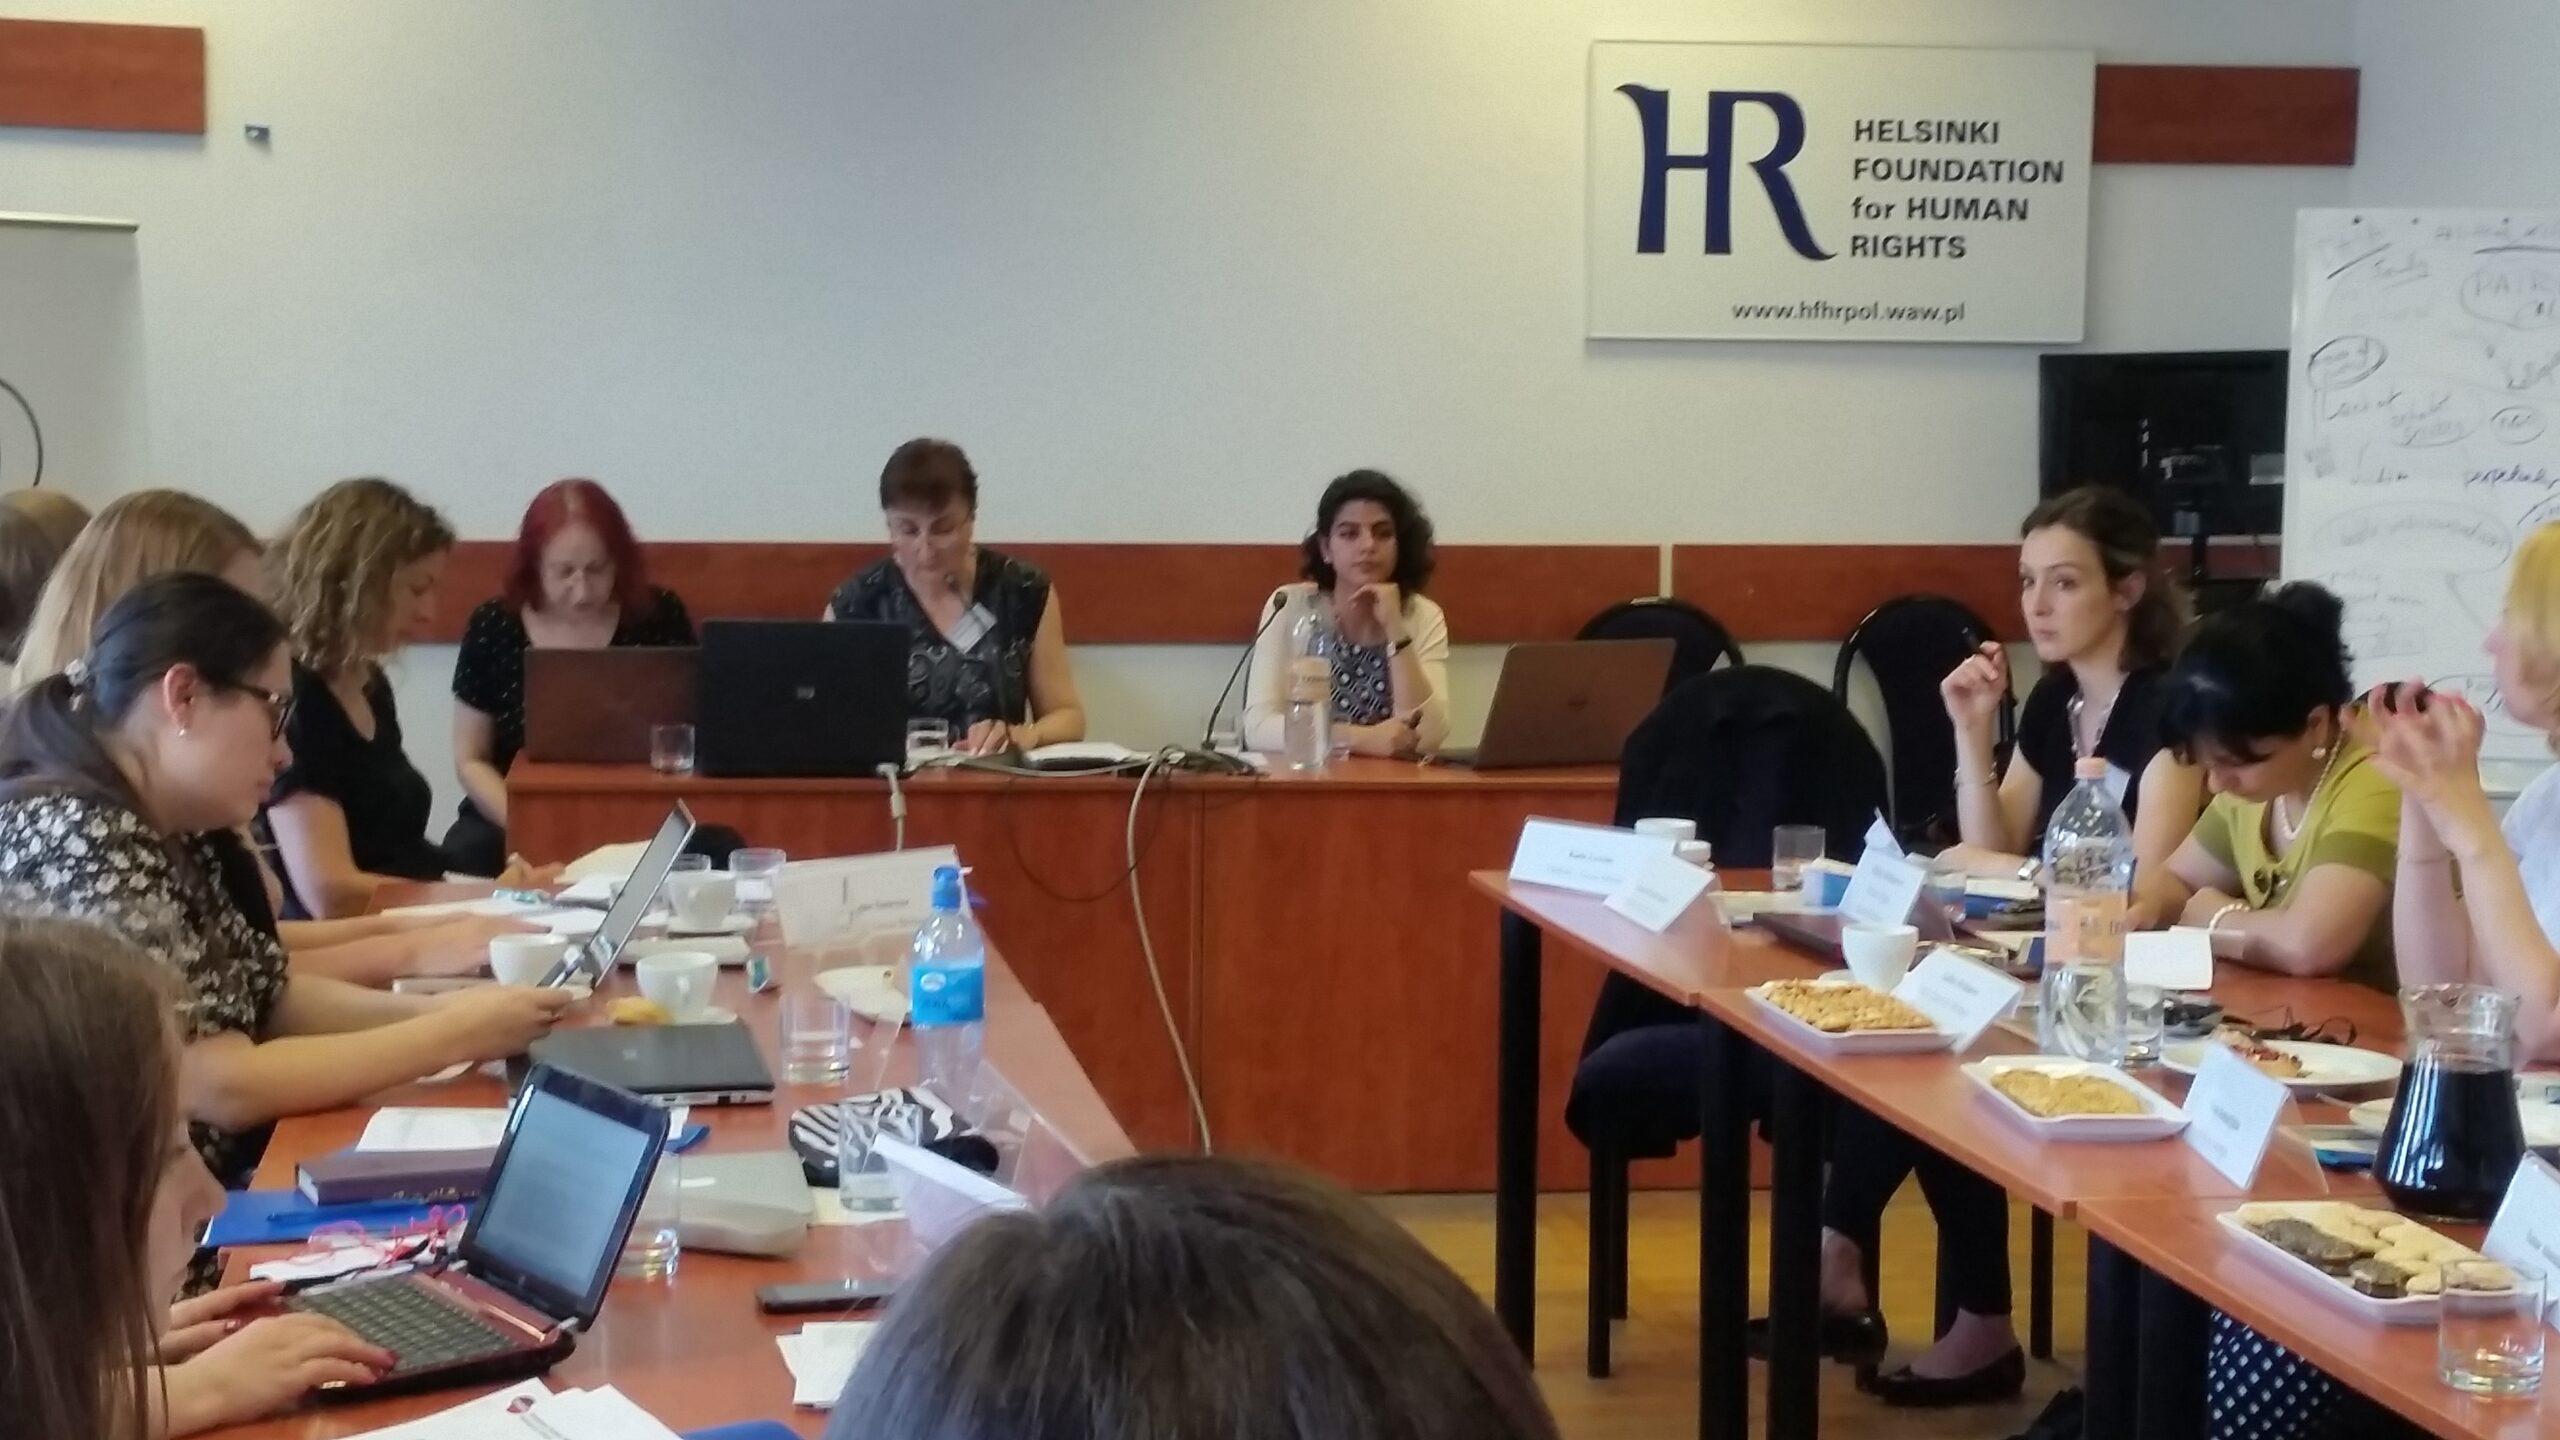 Combatting violence against women through litigation